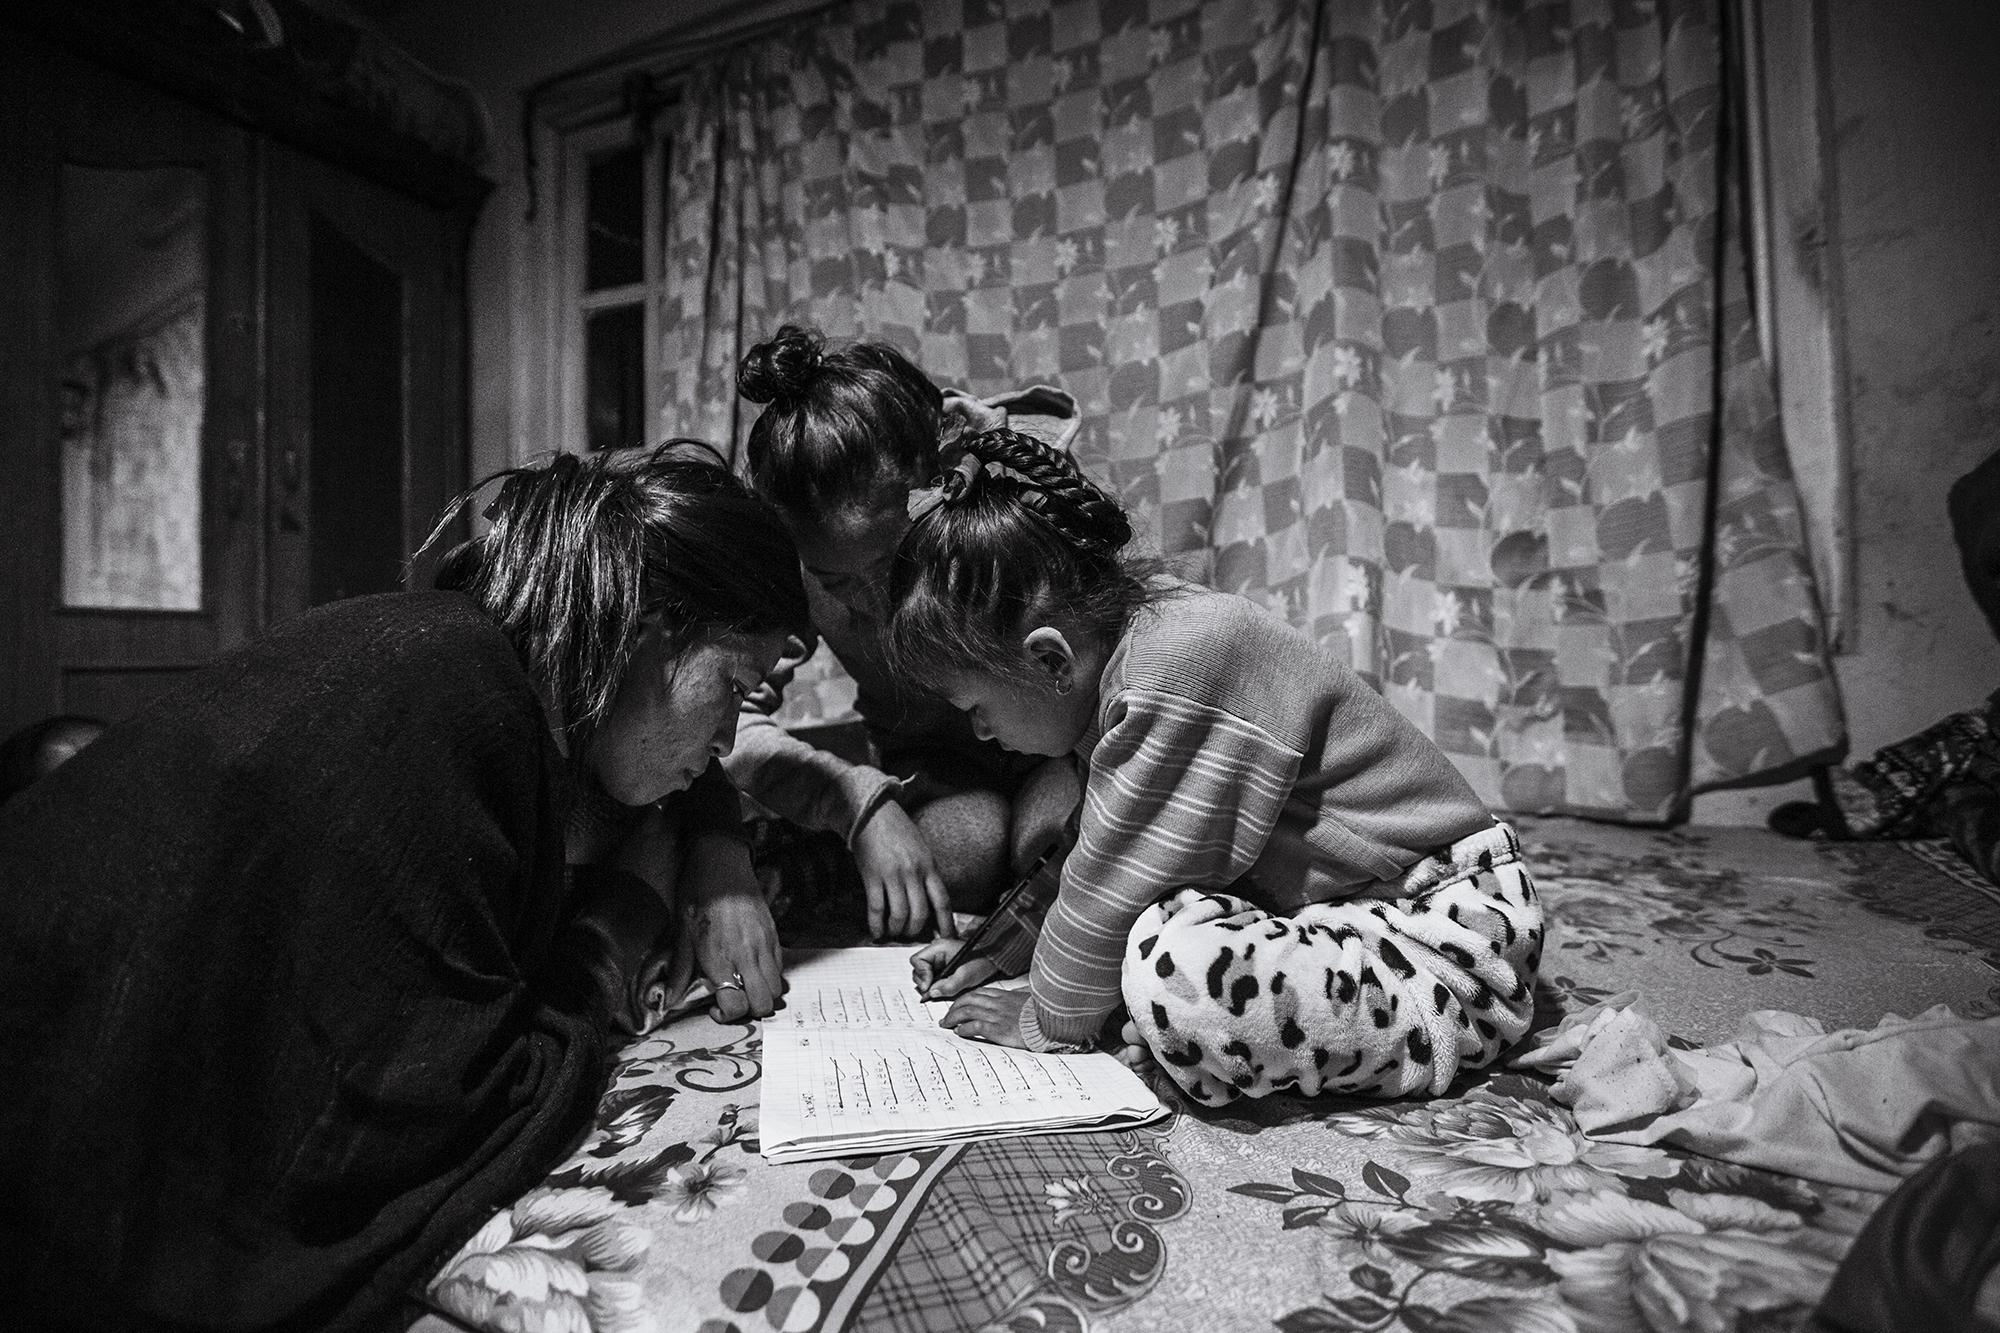 Anu & Anita help Anjika with her schoolwork.